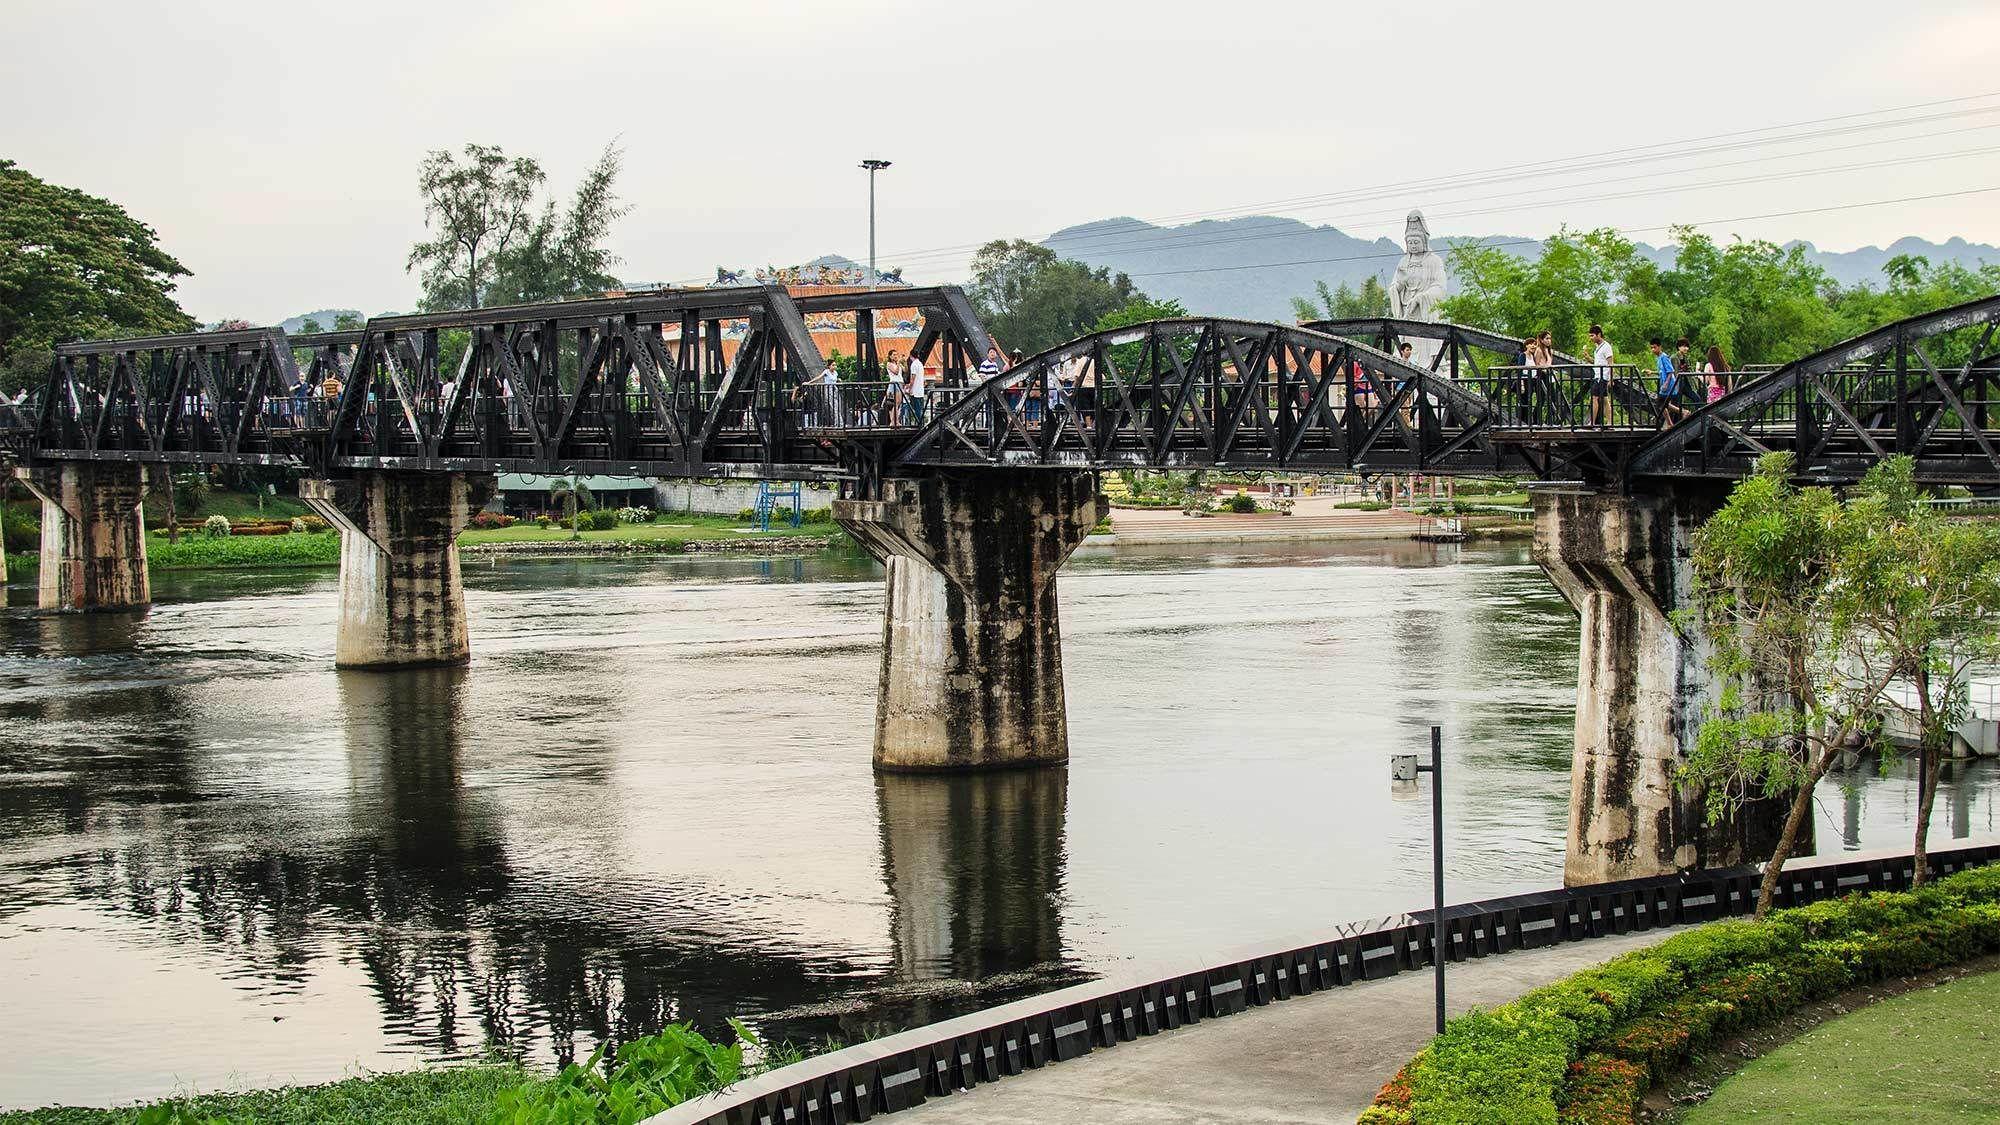 War Cemeteries, JEATH Museum & Bridge on the River Kwai Half-Day Tour